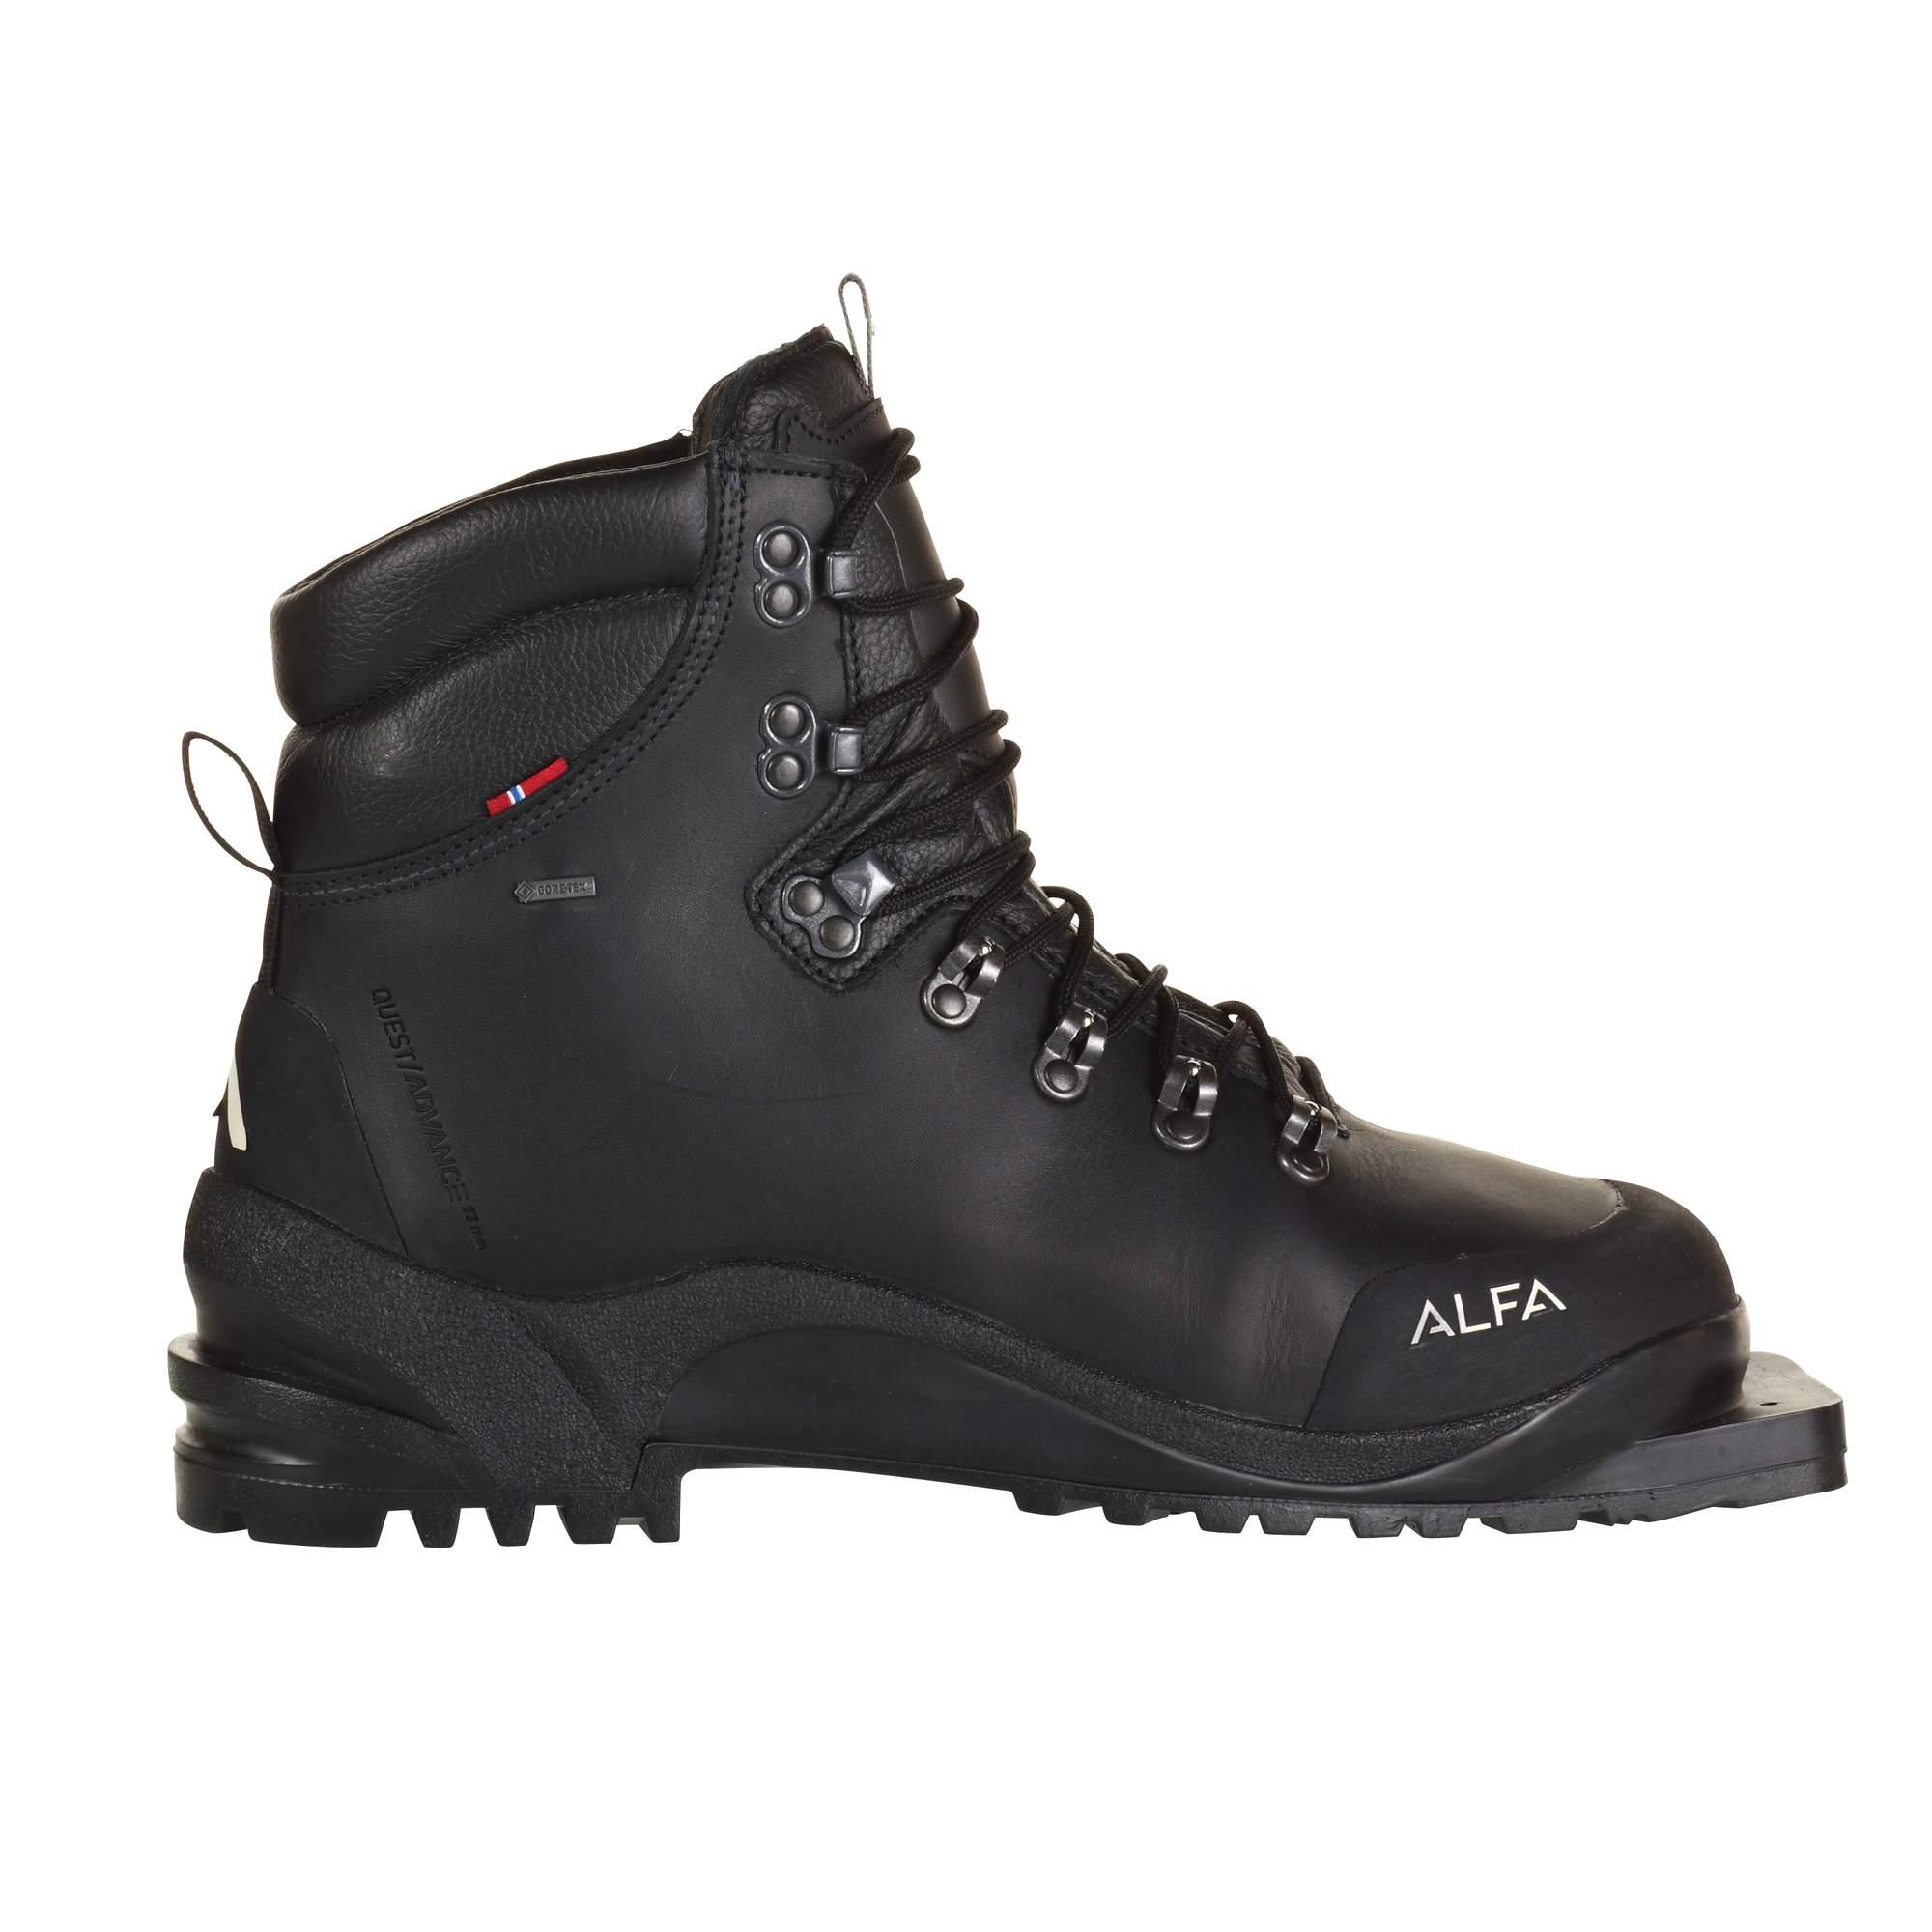 Alfa BC 75 Advance Unisex - Skistiefel